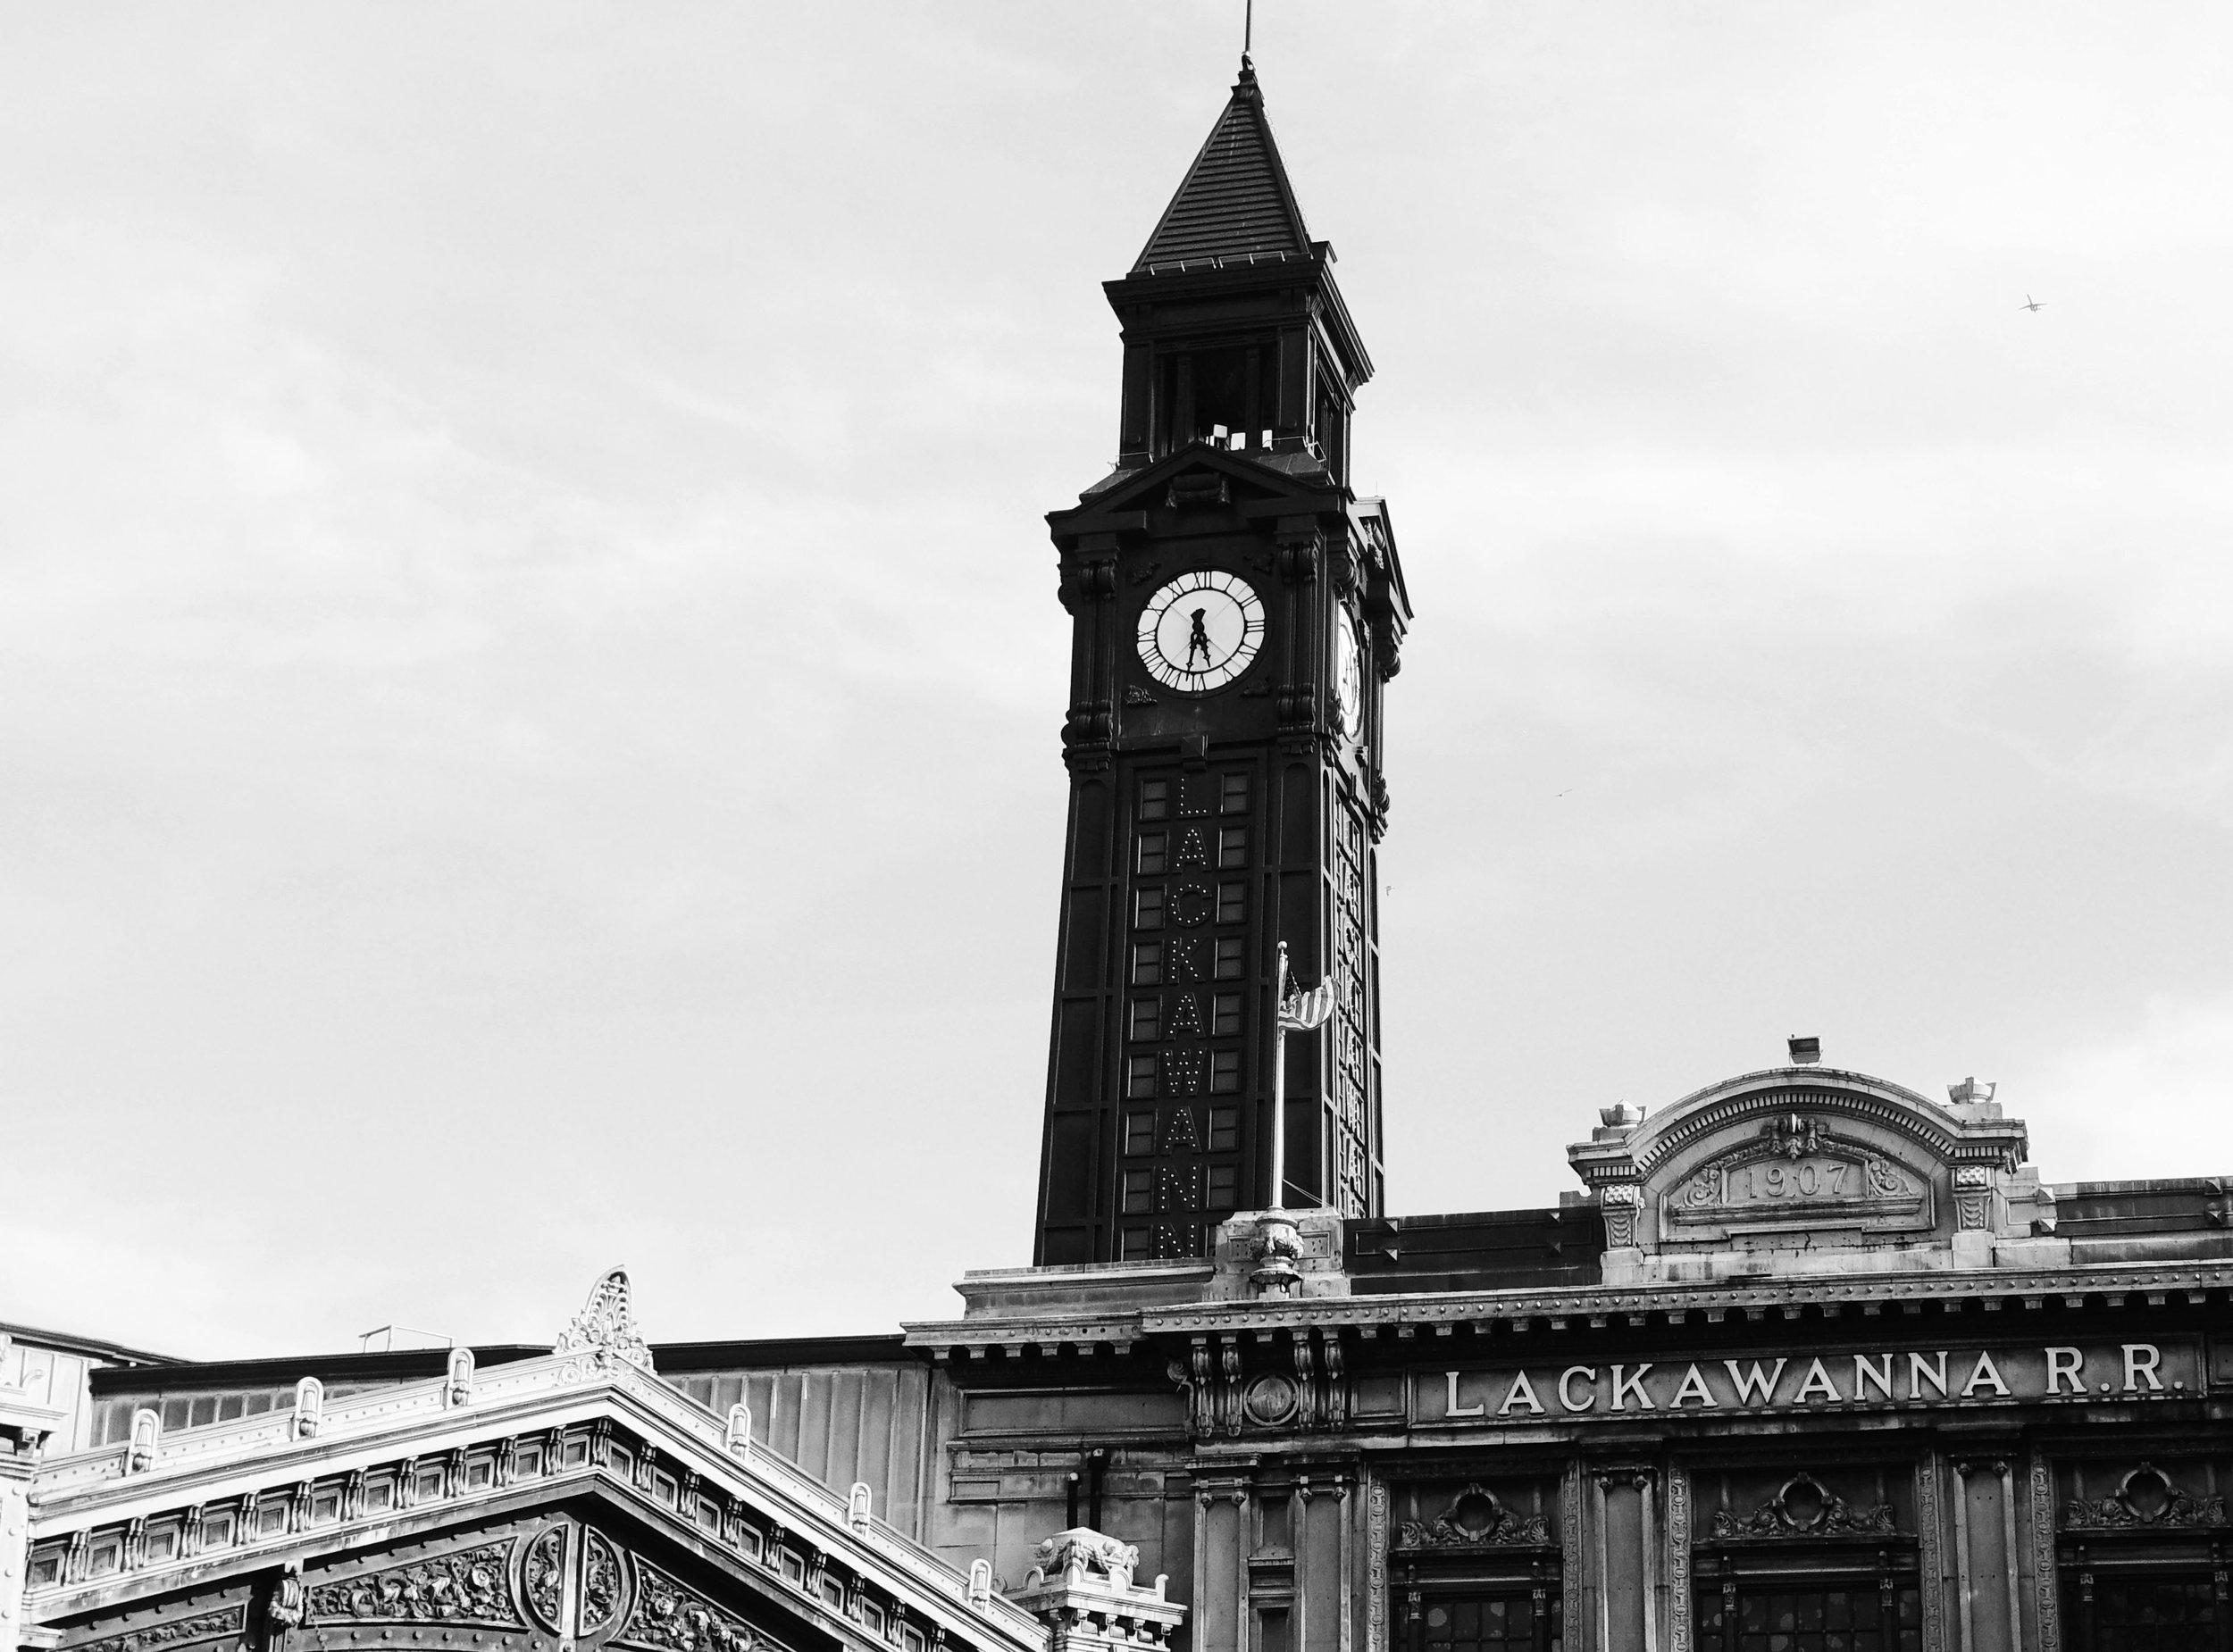 Black and White Lackawanna Train Station Photograph